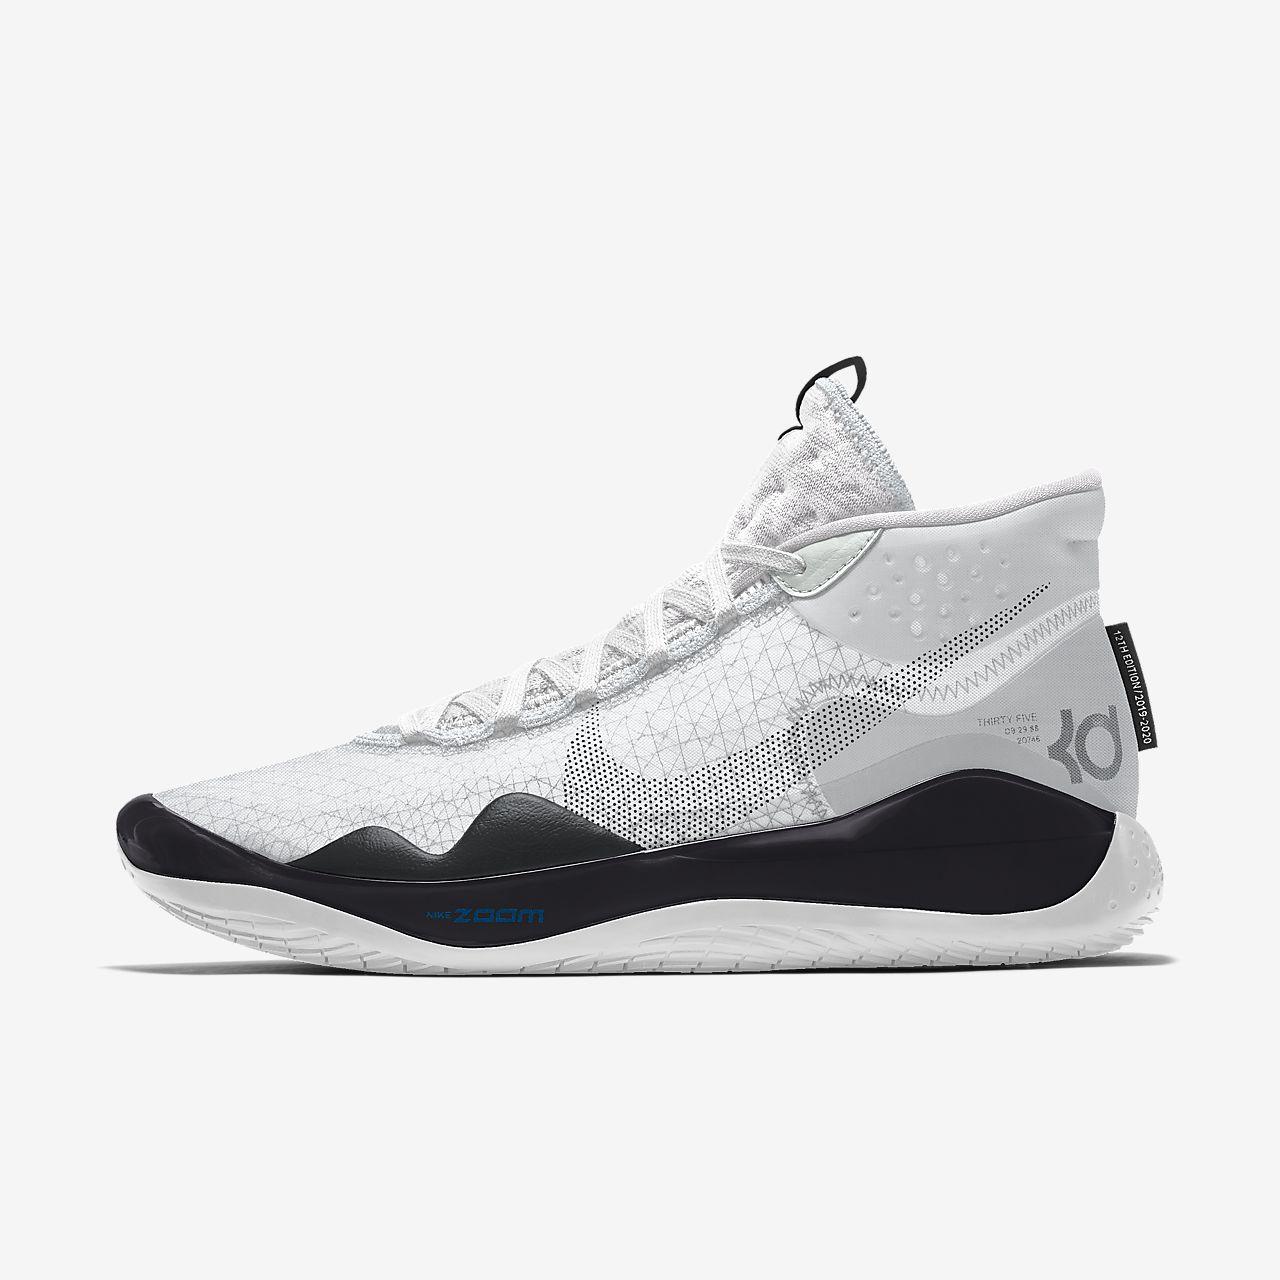 Sapatilhas de basquetebol personalizáveis Nike Zoom KD12 By You